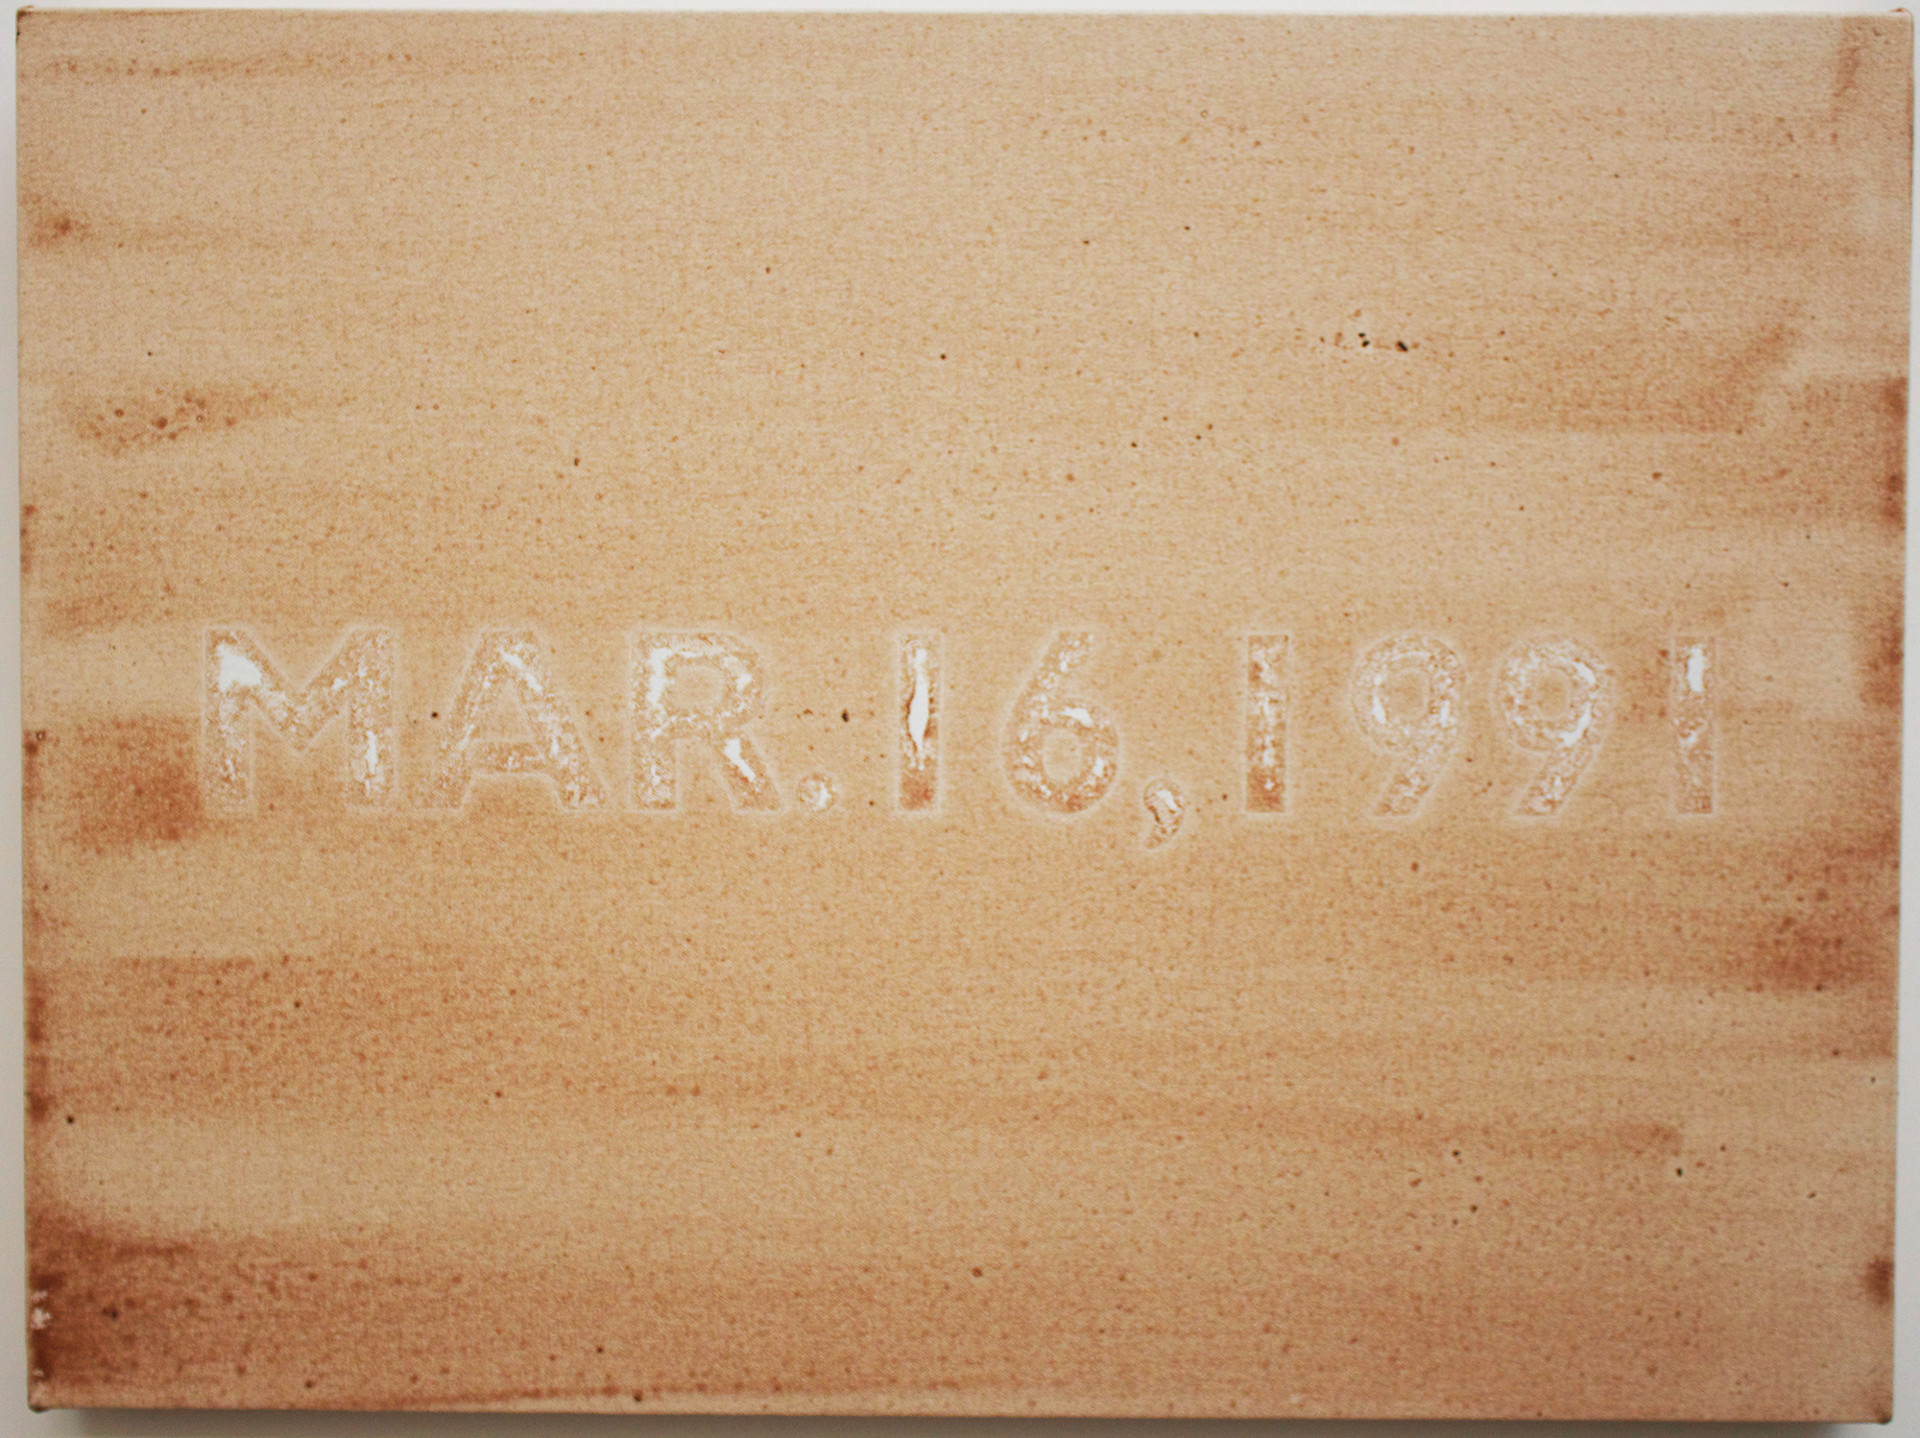 march_16_1991_latasha.jpg